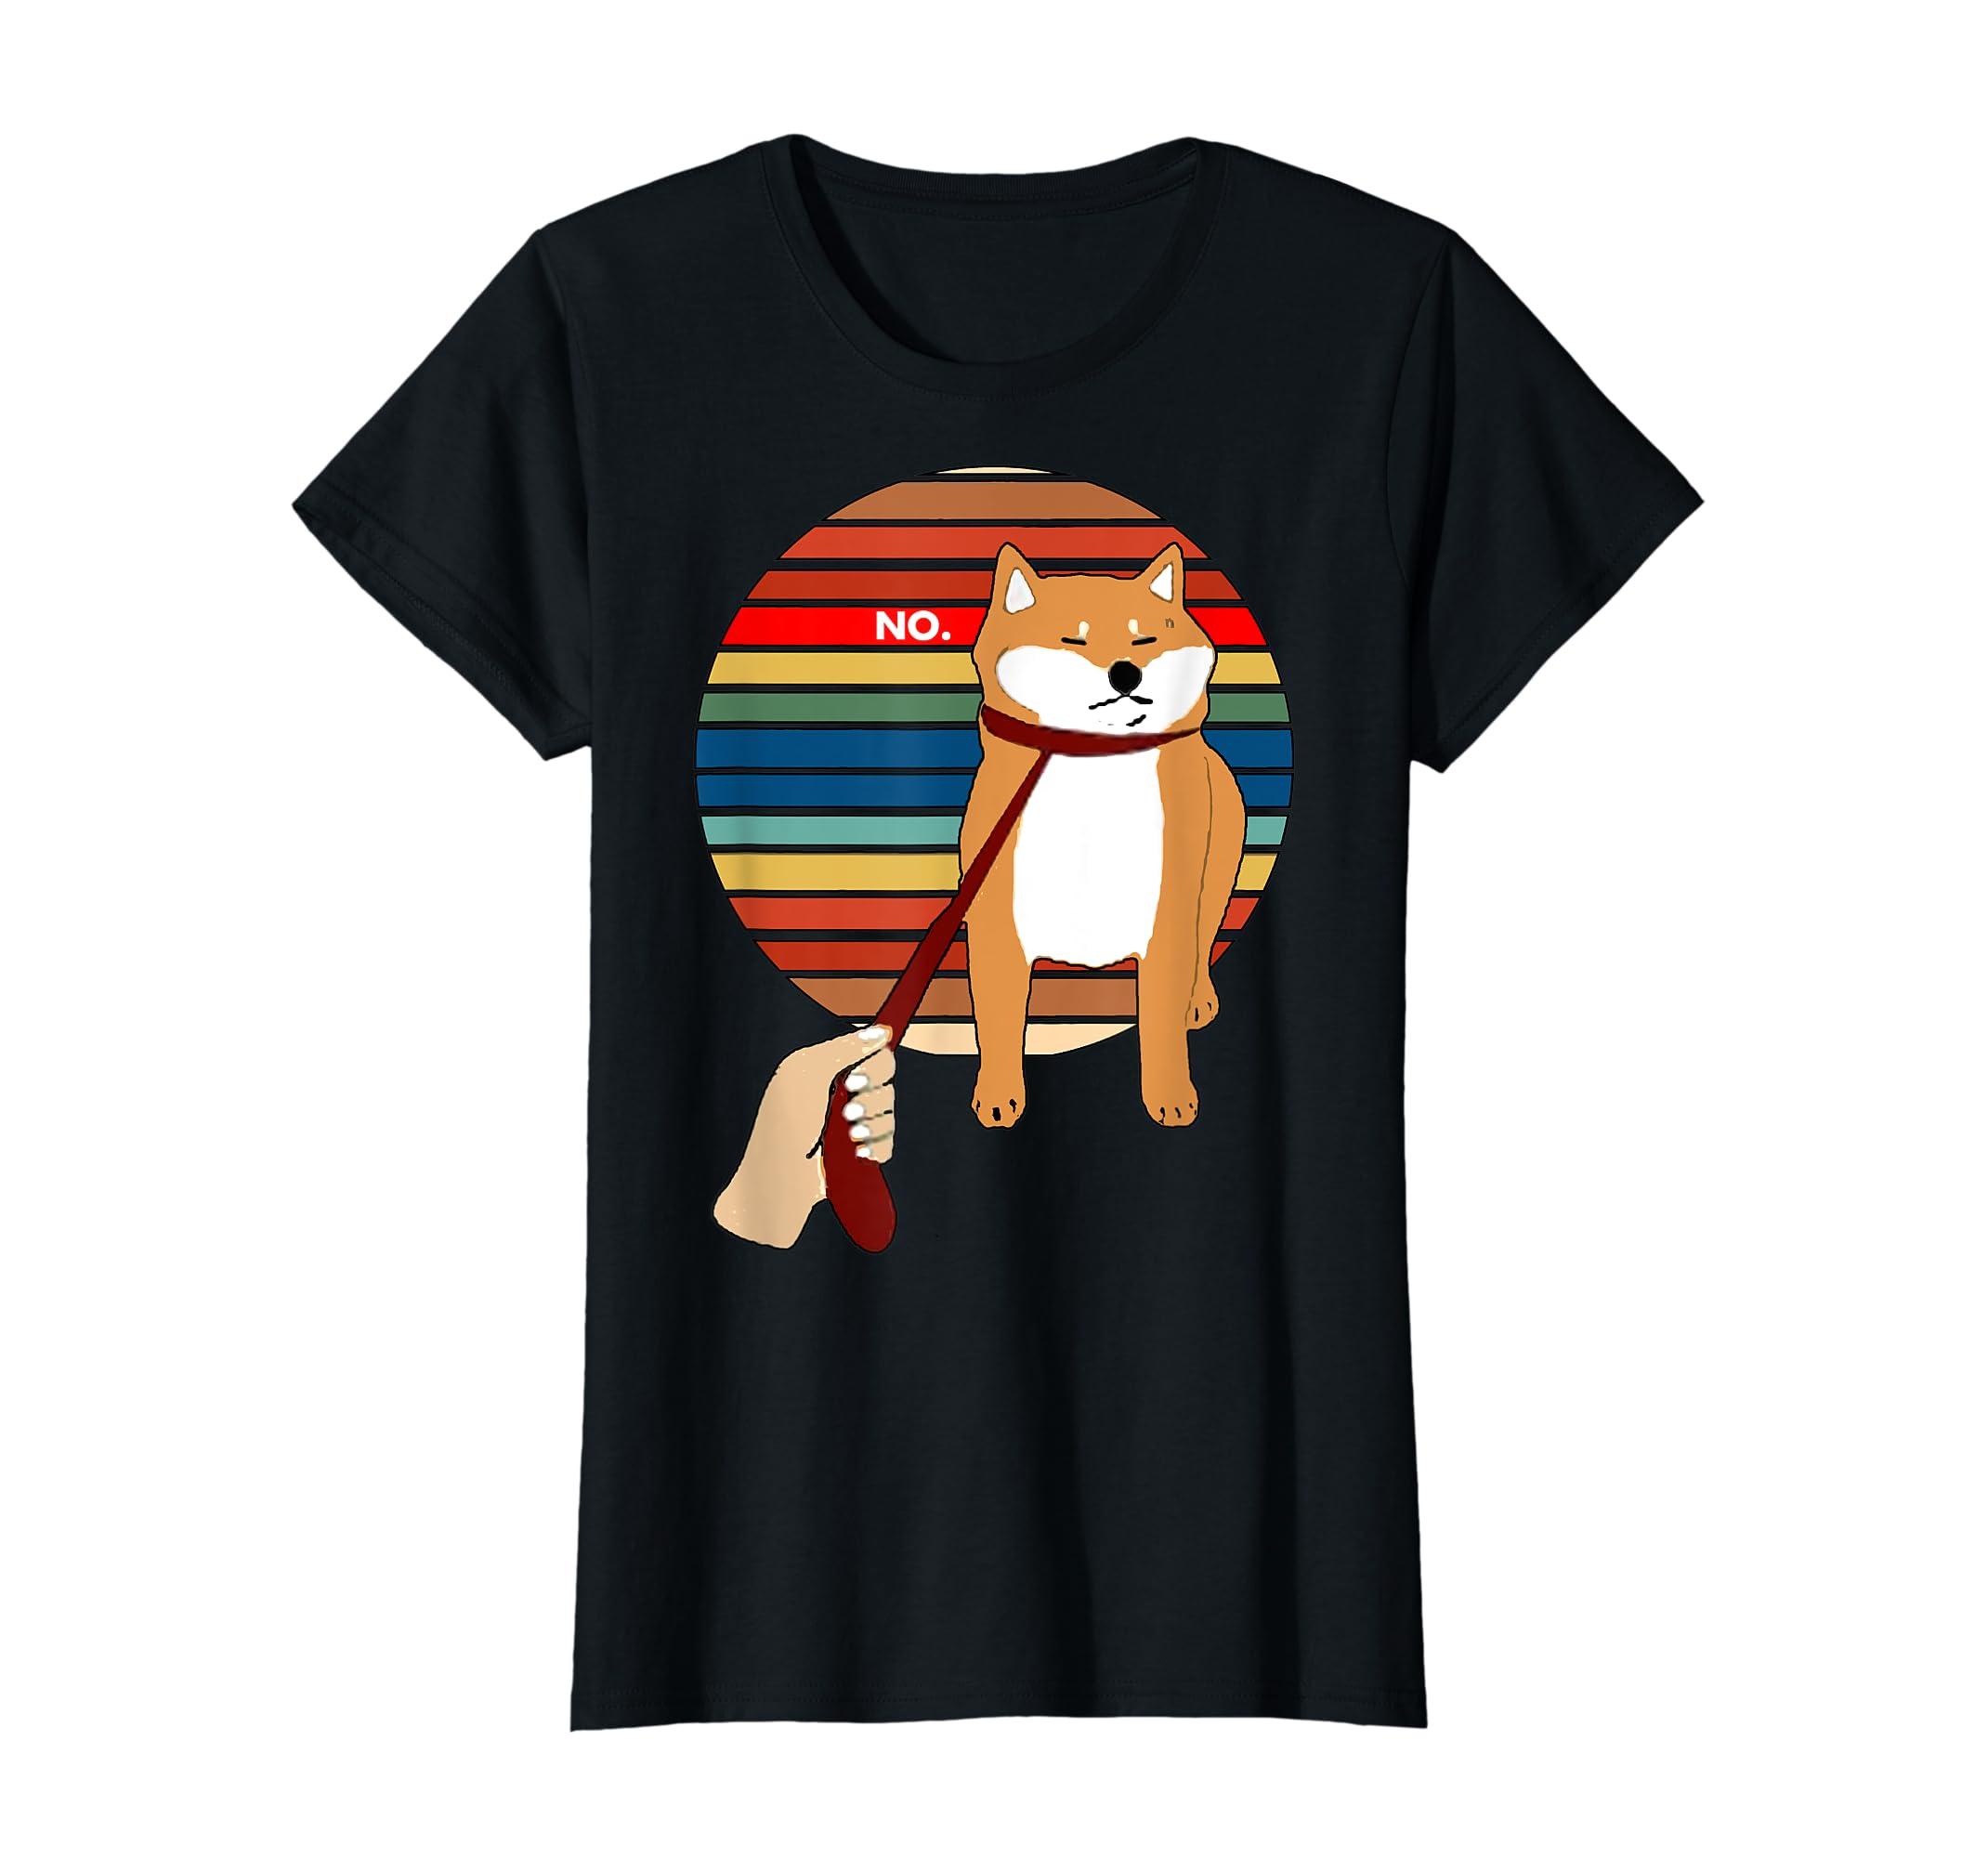 Cute Vintage Retro Shiba Inu Nope Dog Tee Shirt-Women's T-Shirt-Black